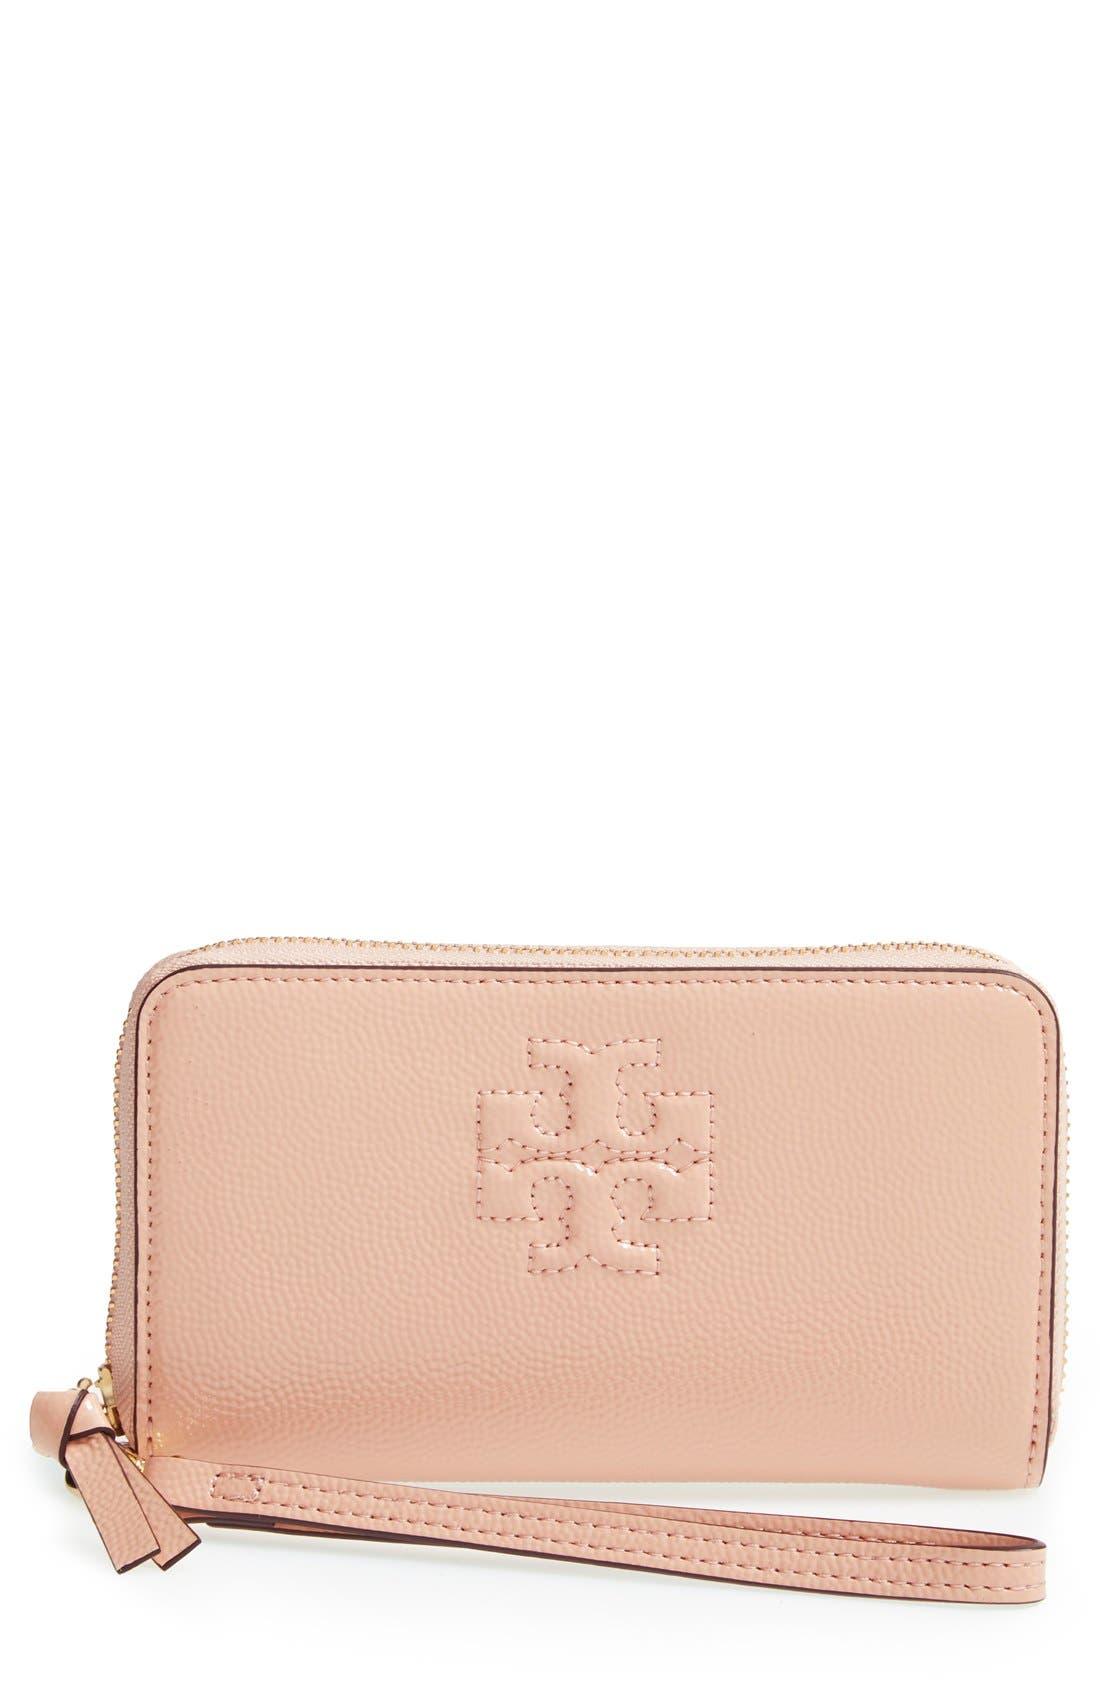 Main Image - Tory Burch 'Thea' Smartphone Wristlet Wallet